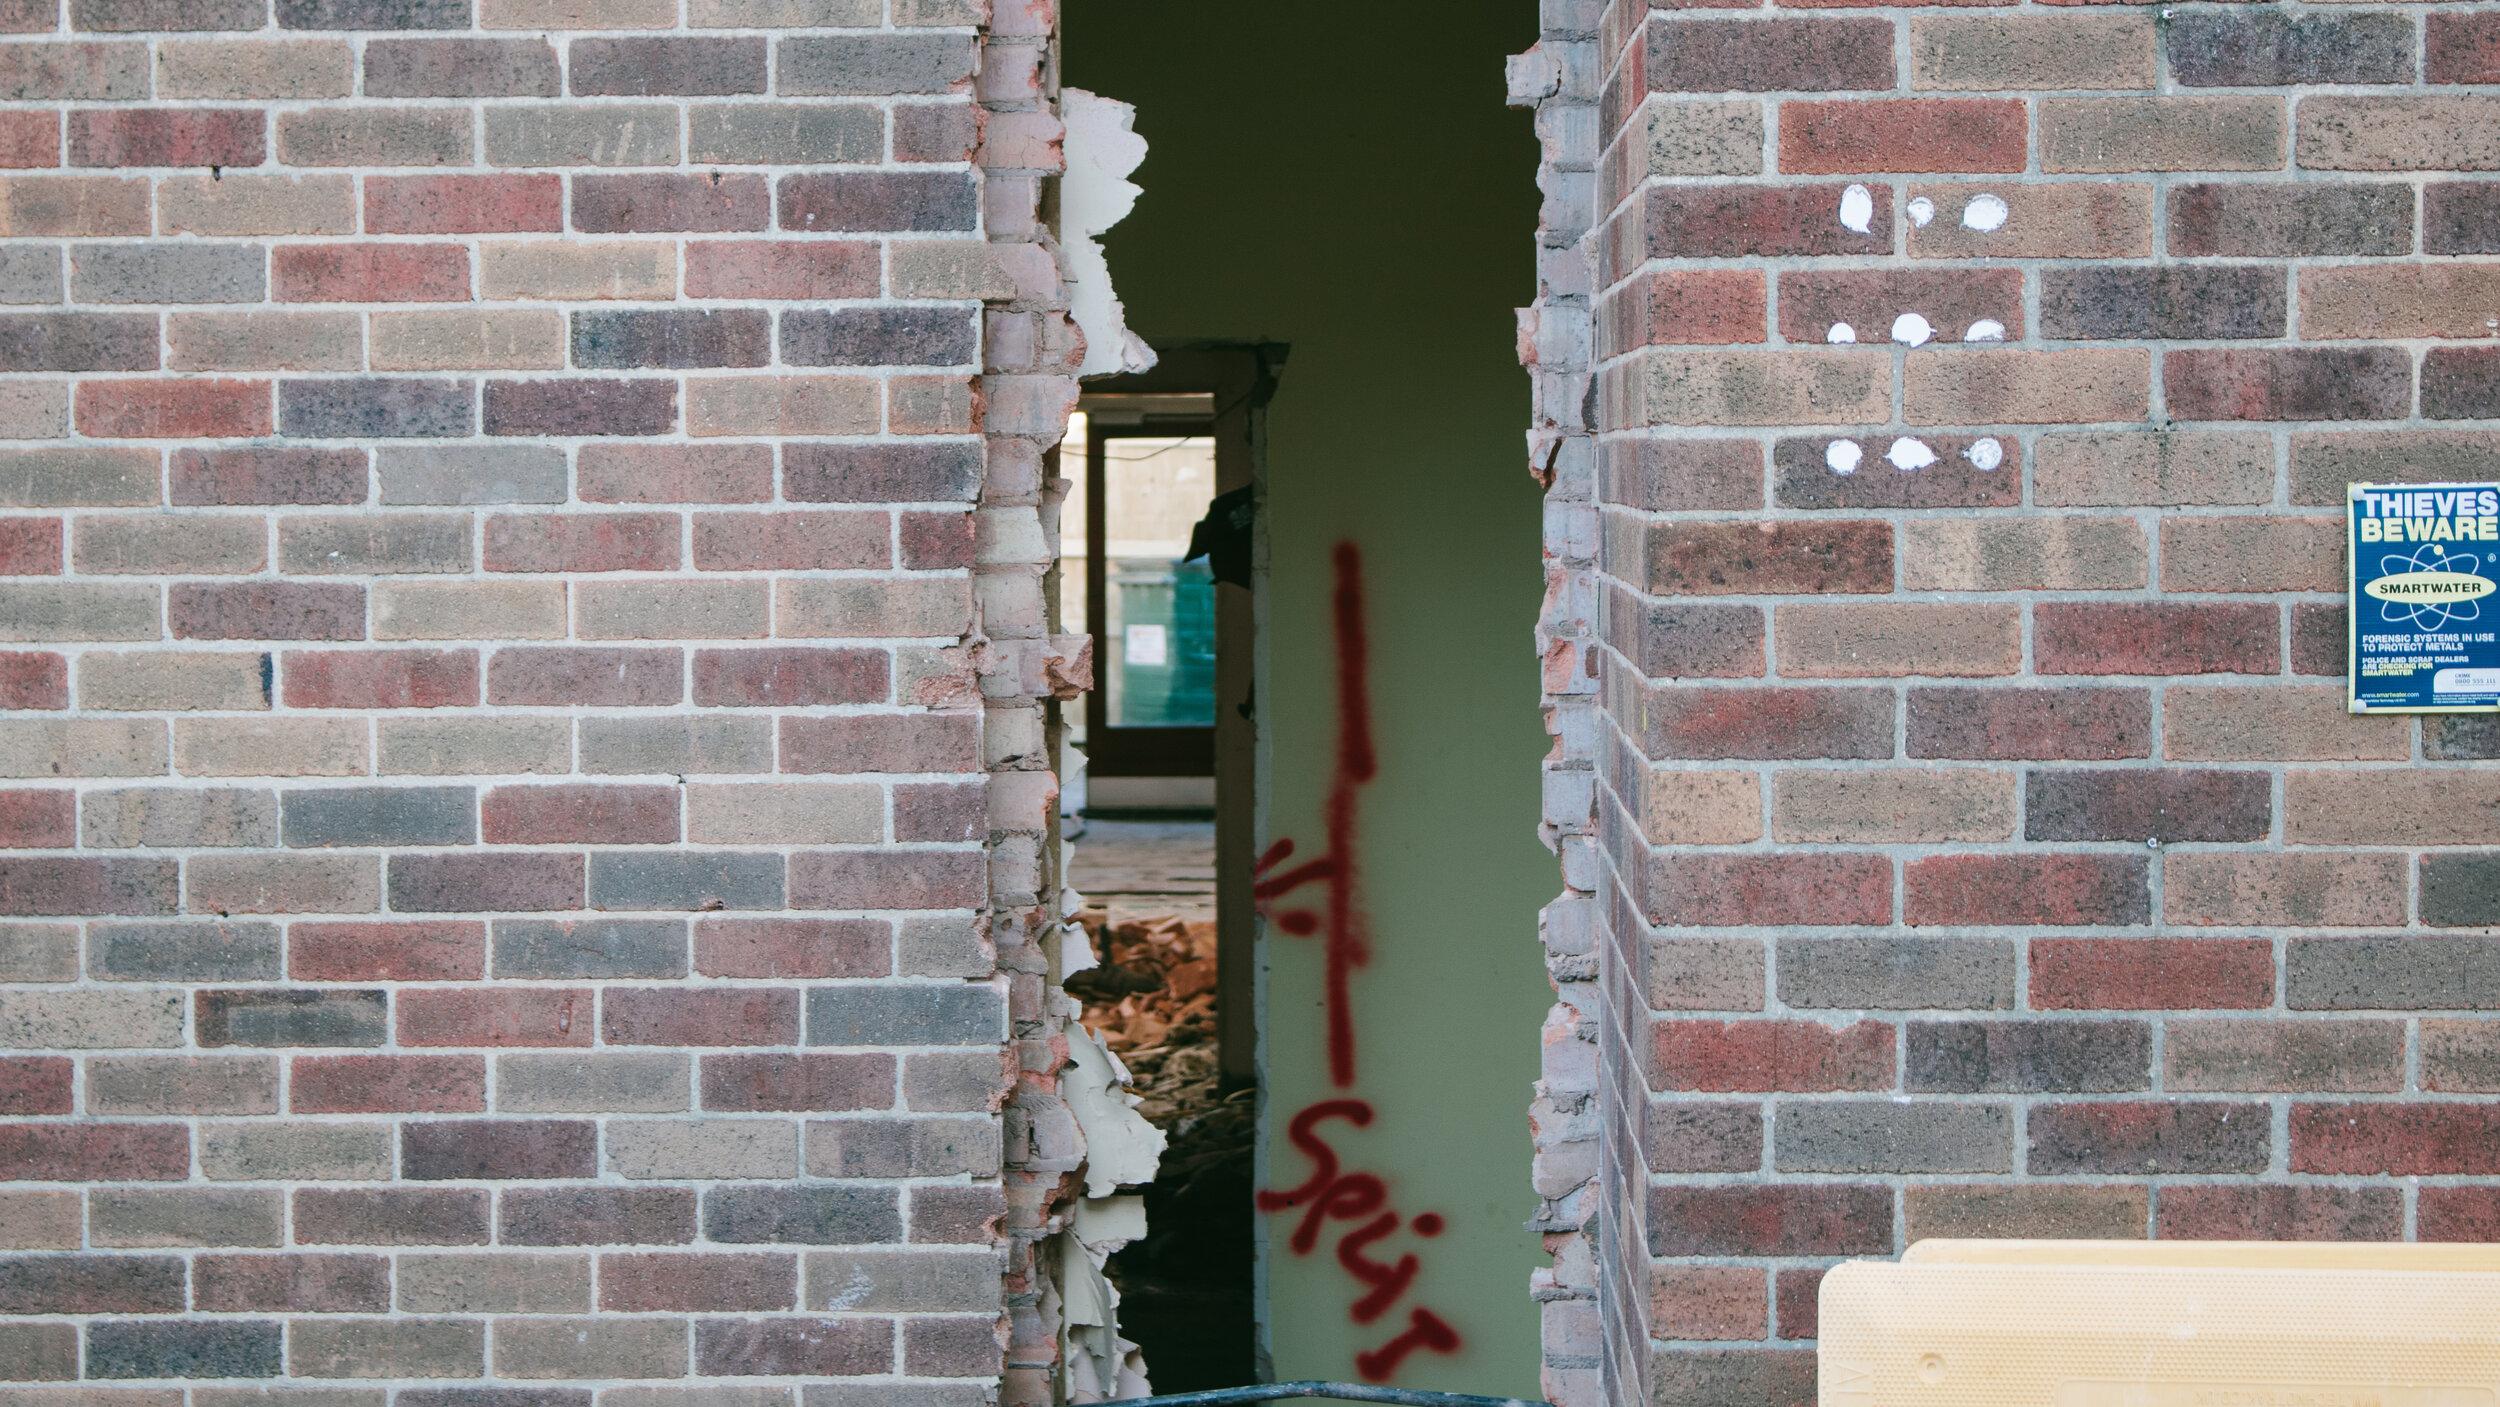 st-johns-harborne-bfm-demolition-oct-19-je-2923.jpg